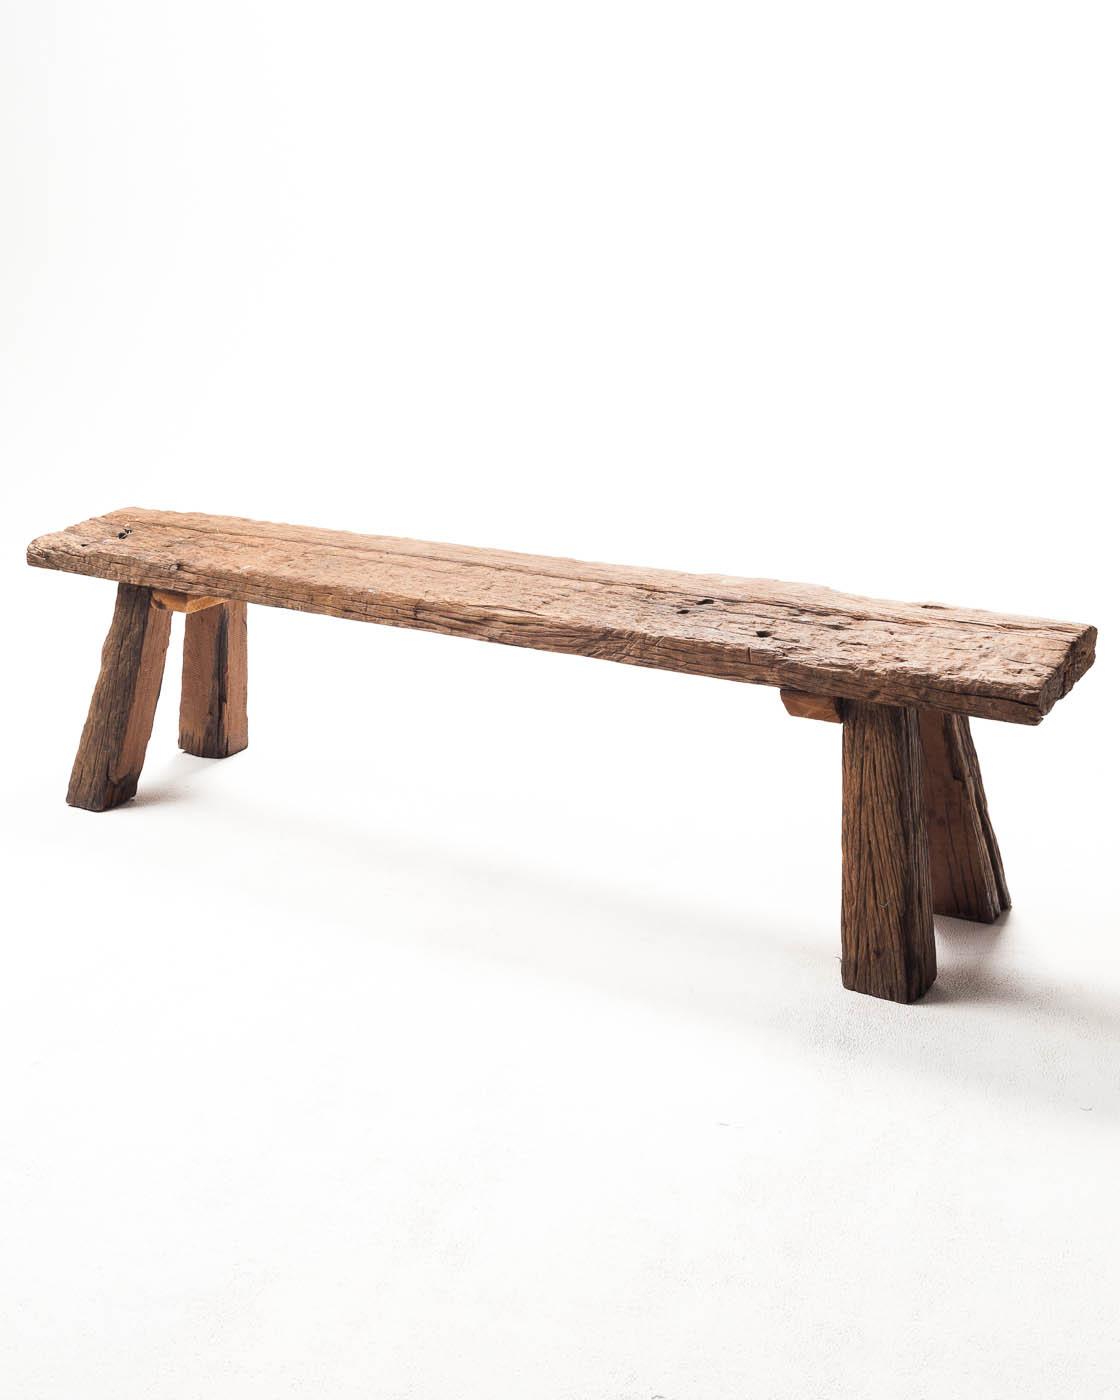 Enjoyable Ab006 Reclaimed Wood Bench Prop Rental Acme Brooklyn Ibusinesslaw Wood Chair Design Ideas Ibusinesslaworg